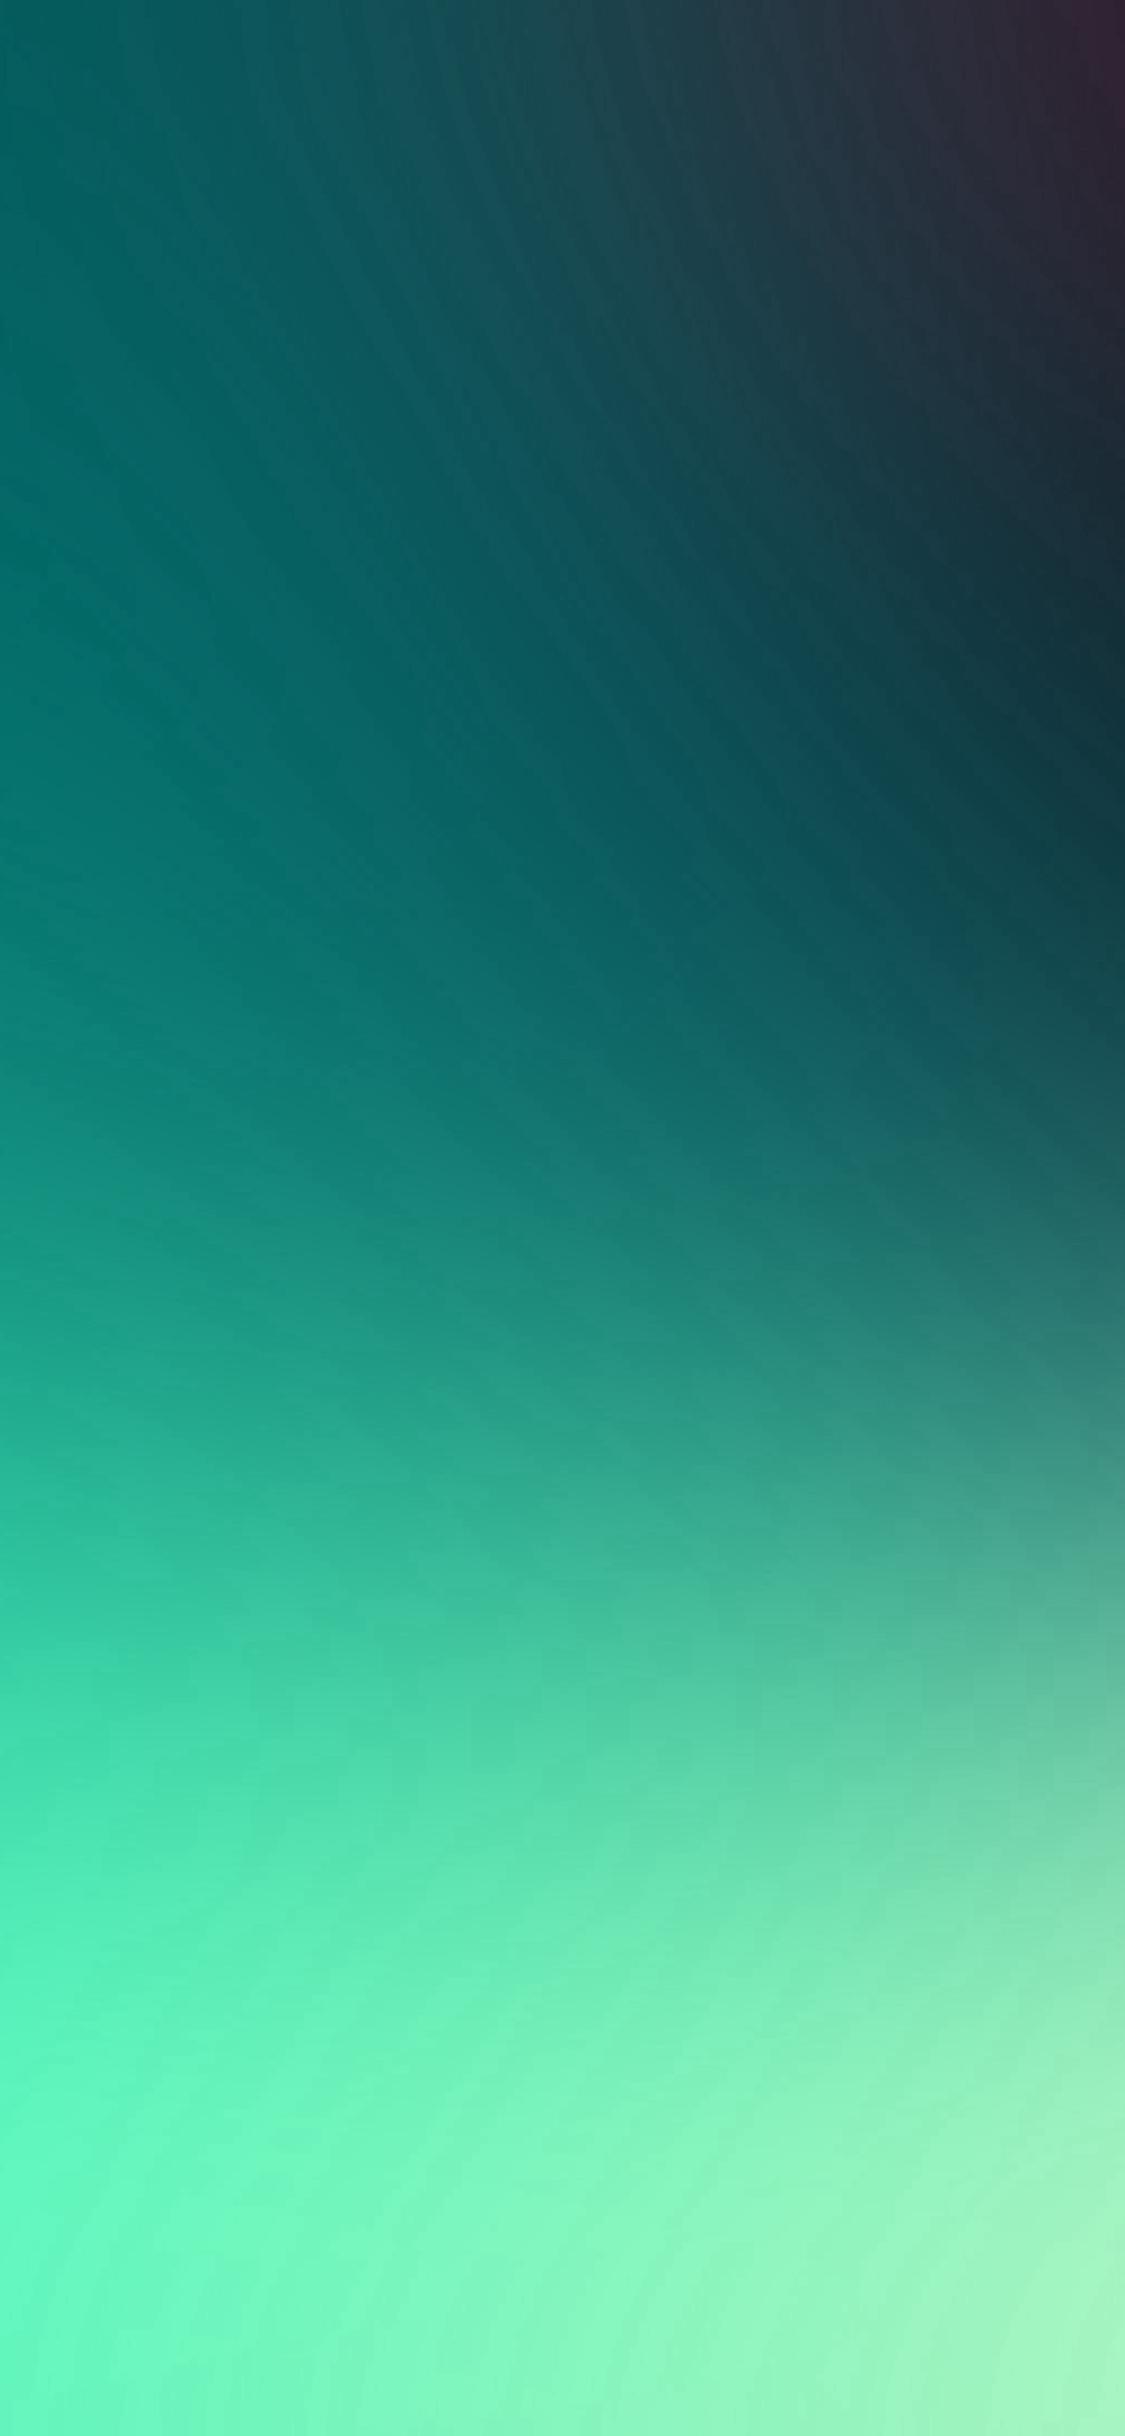 Green Purple Blur Gradation iPhone X wallpaper